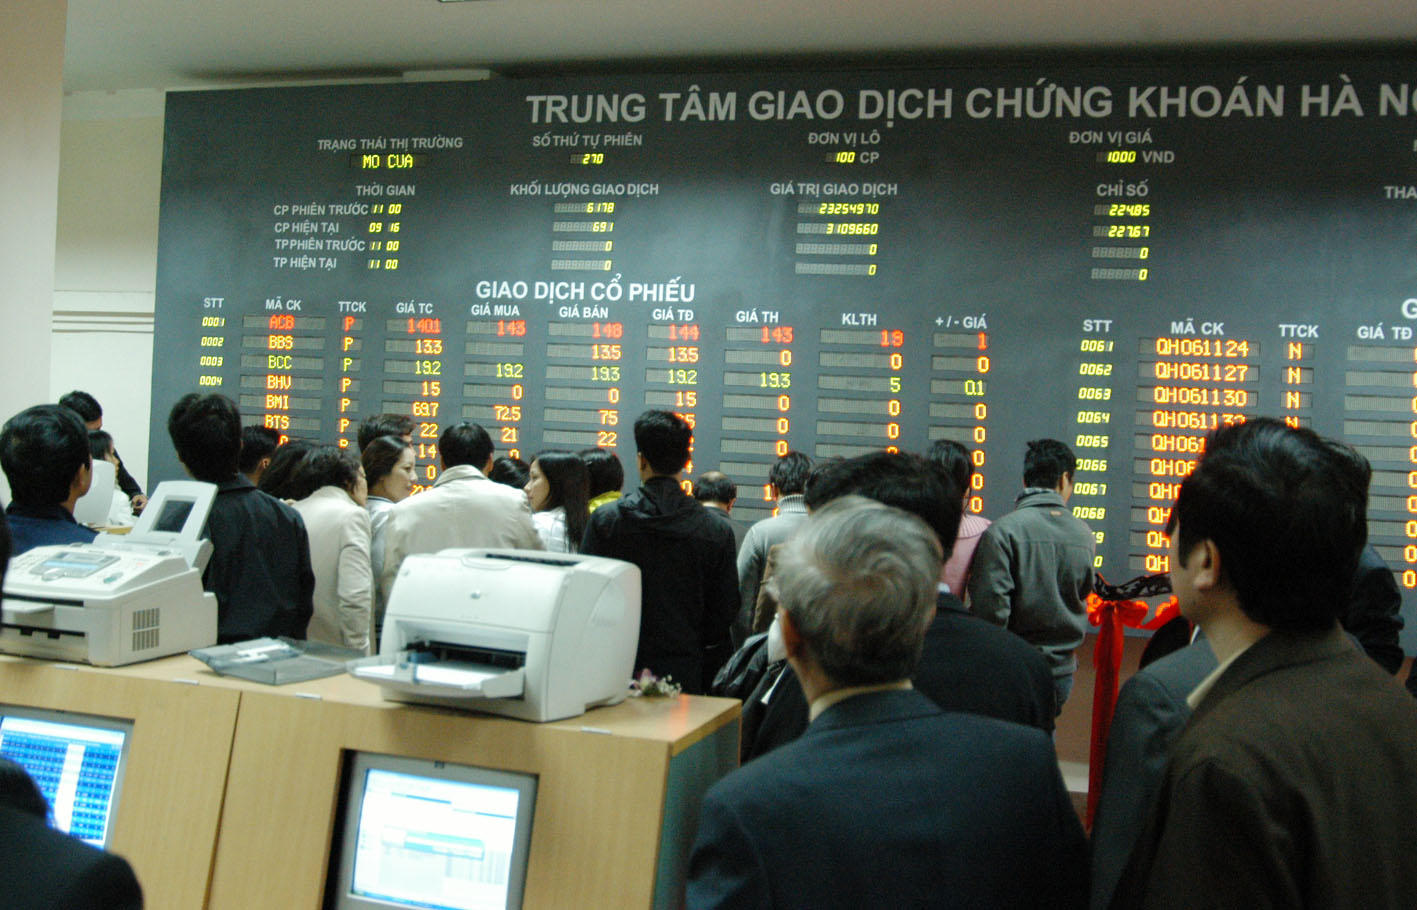 Ghost rumors on stock markets